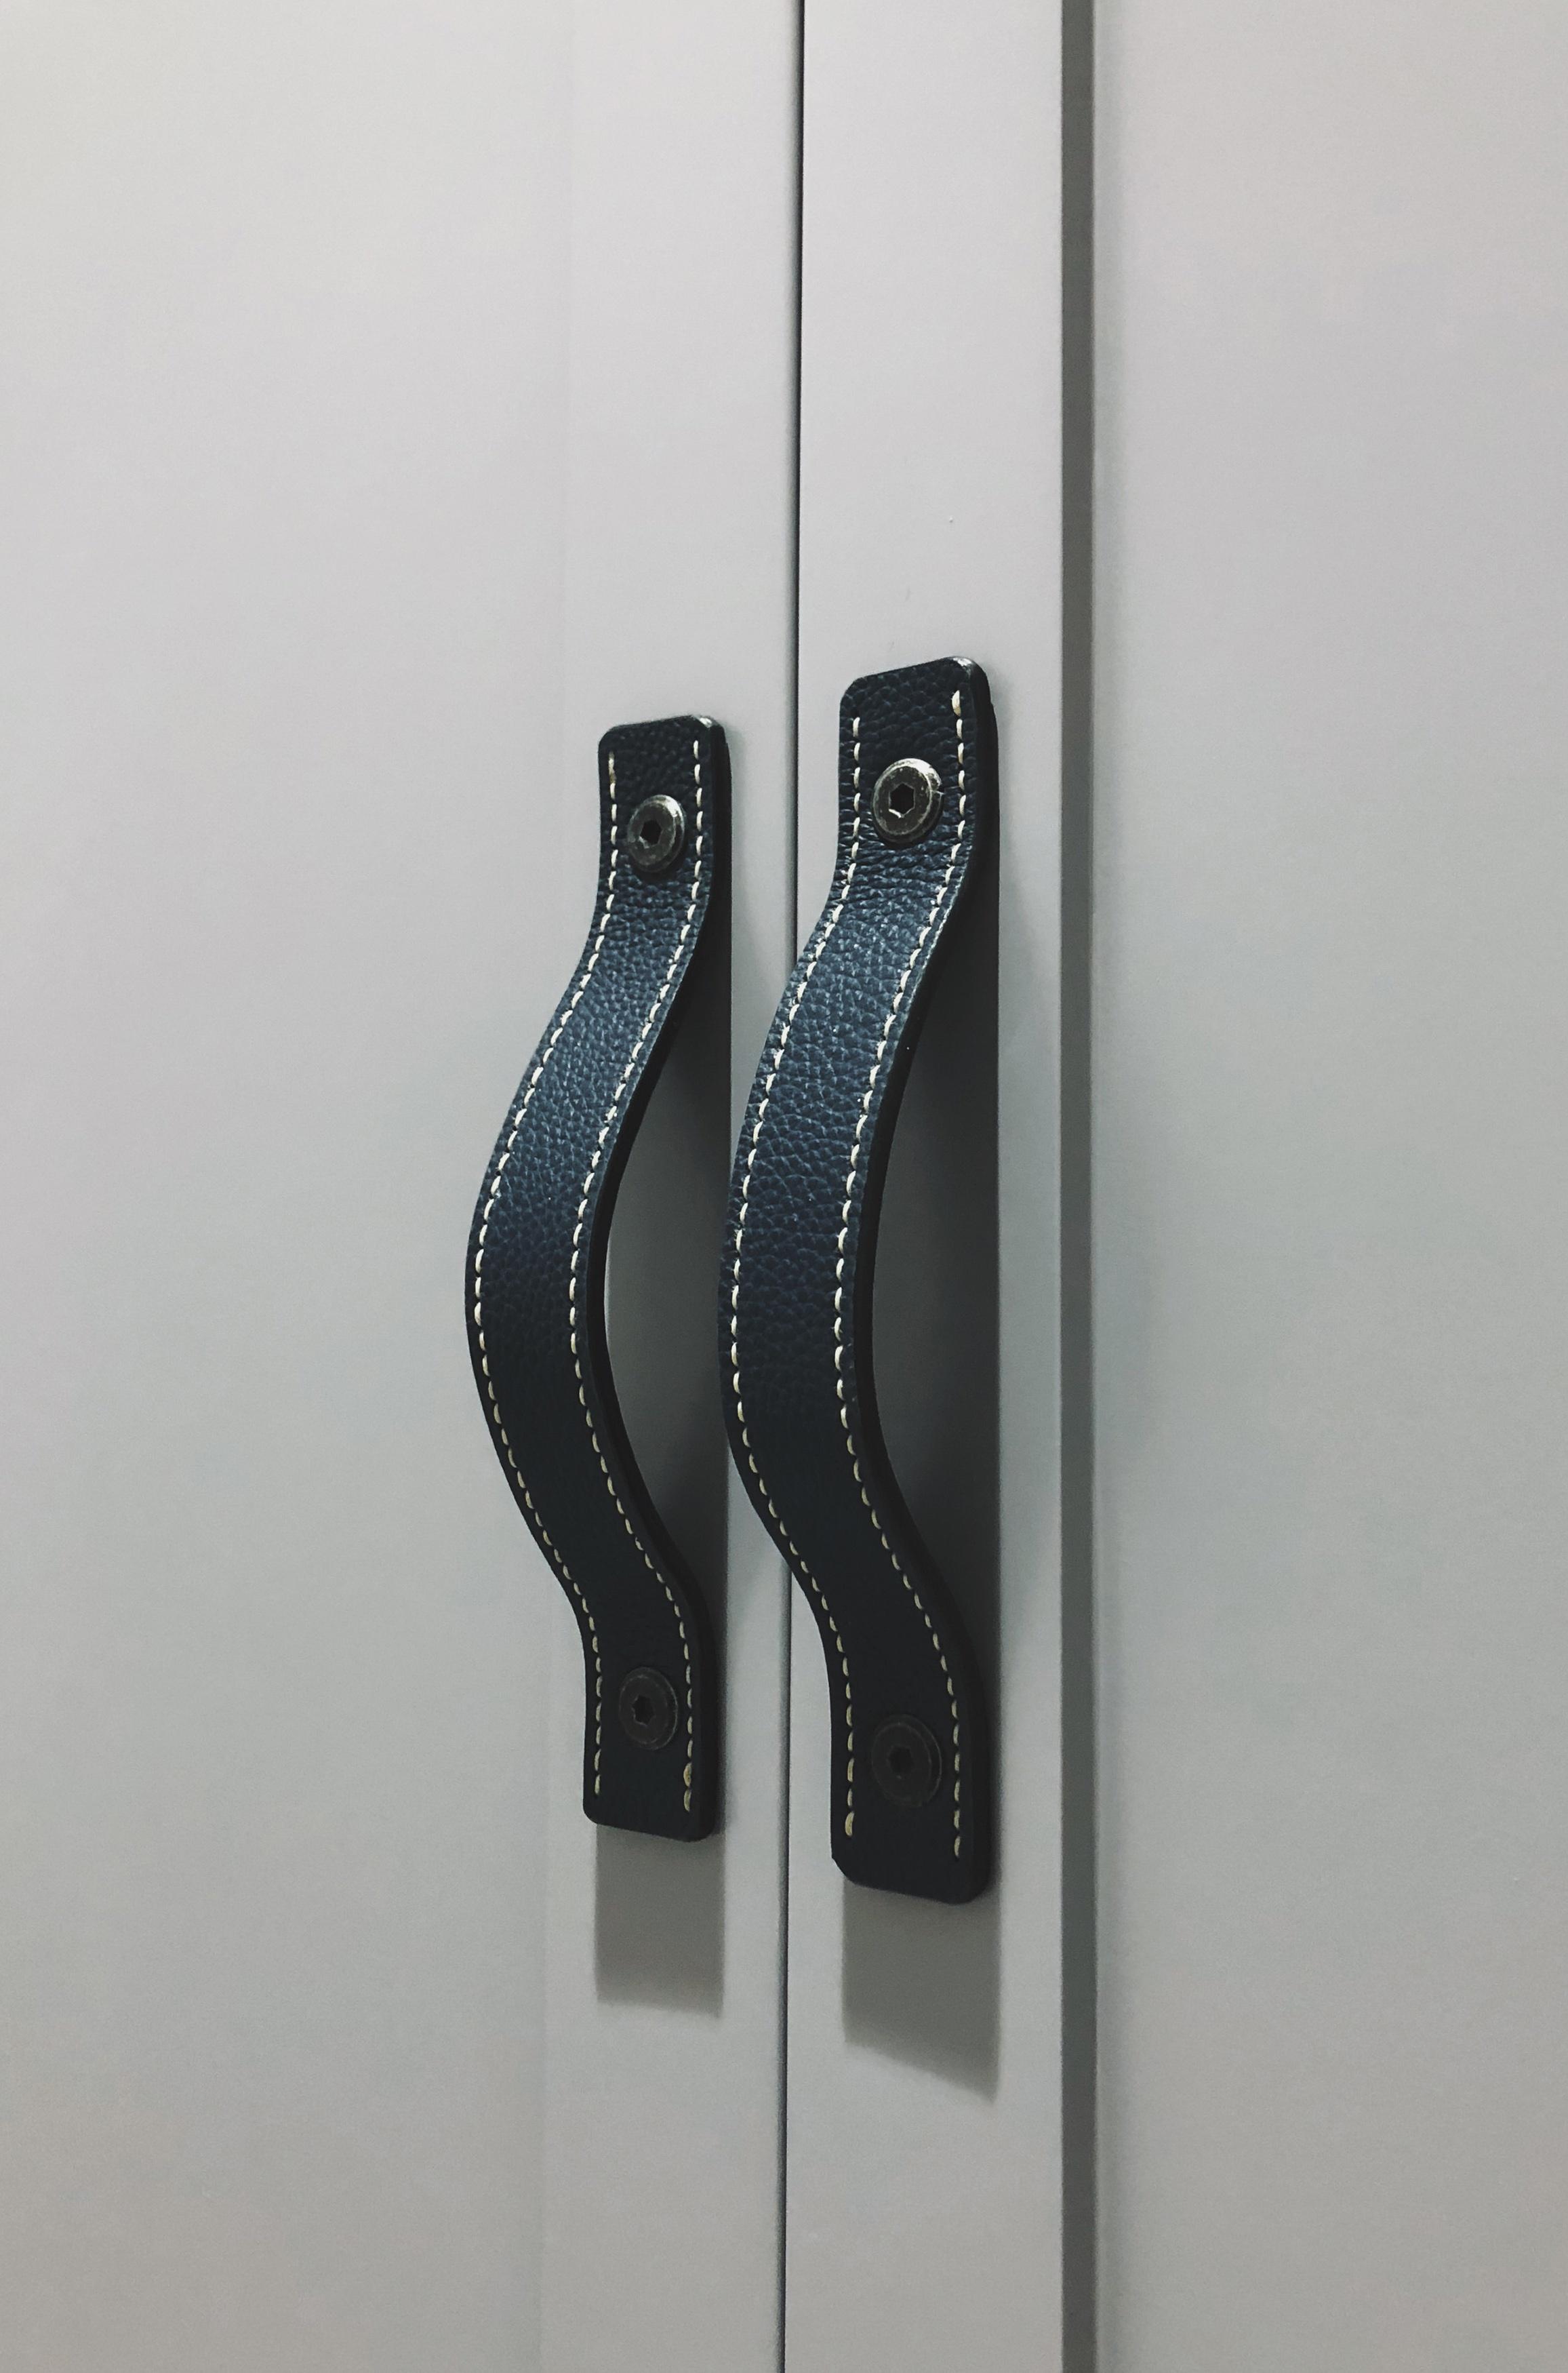 APS Concept   Căn hộ Duplex Masteri Thảo Điền